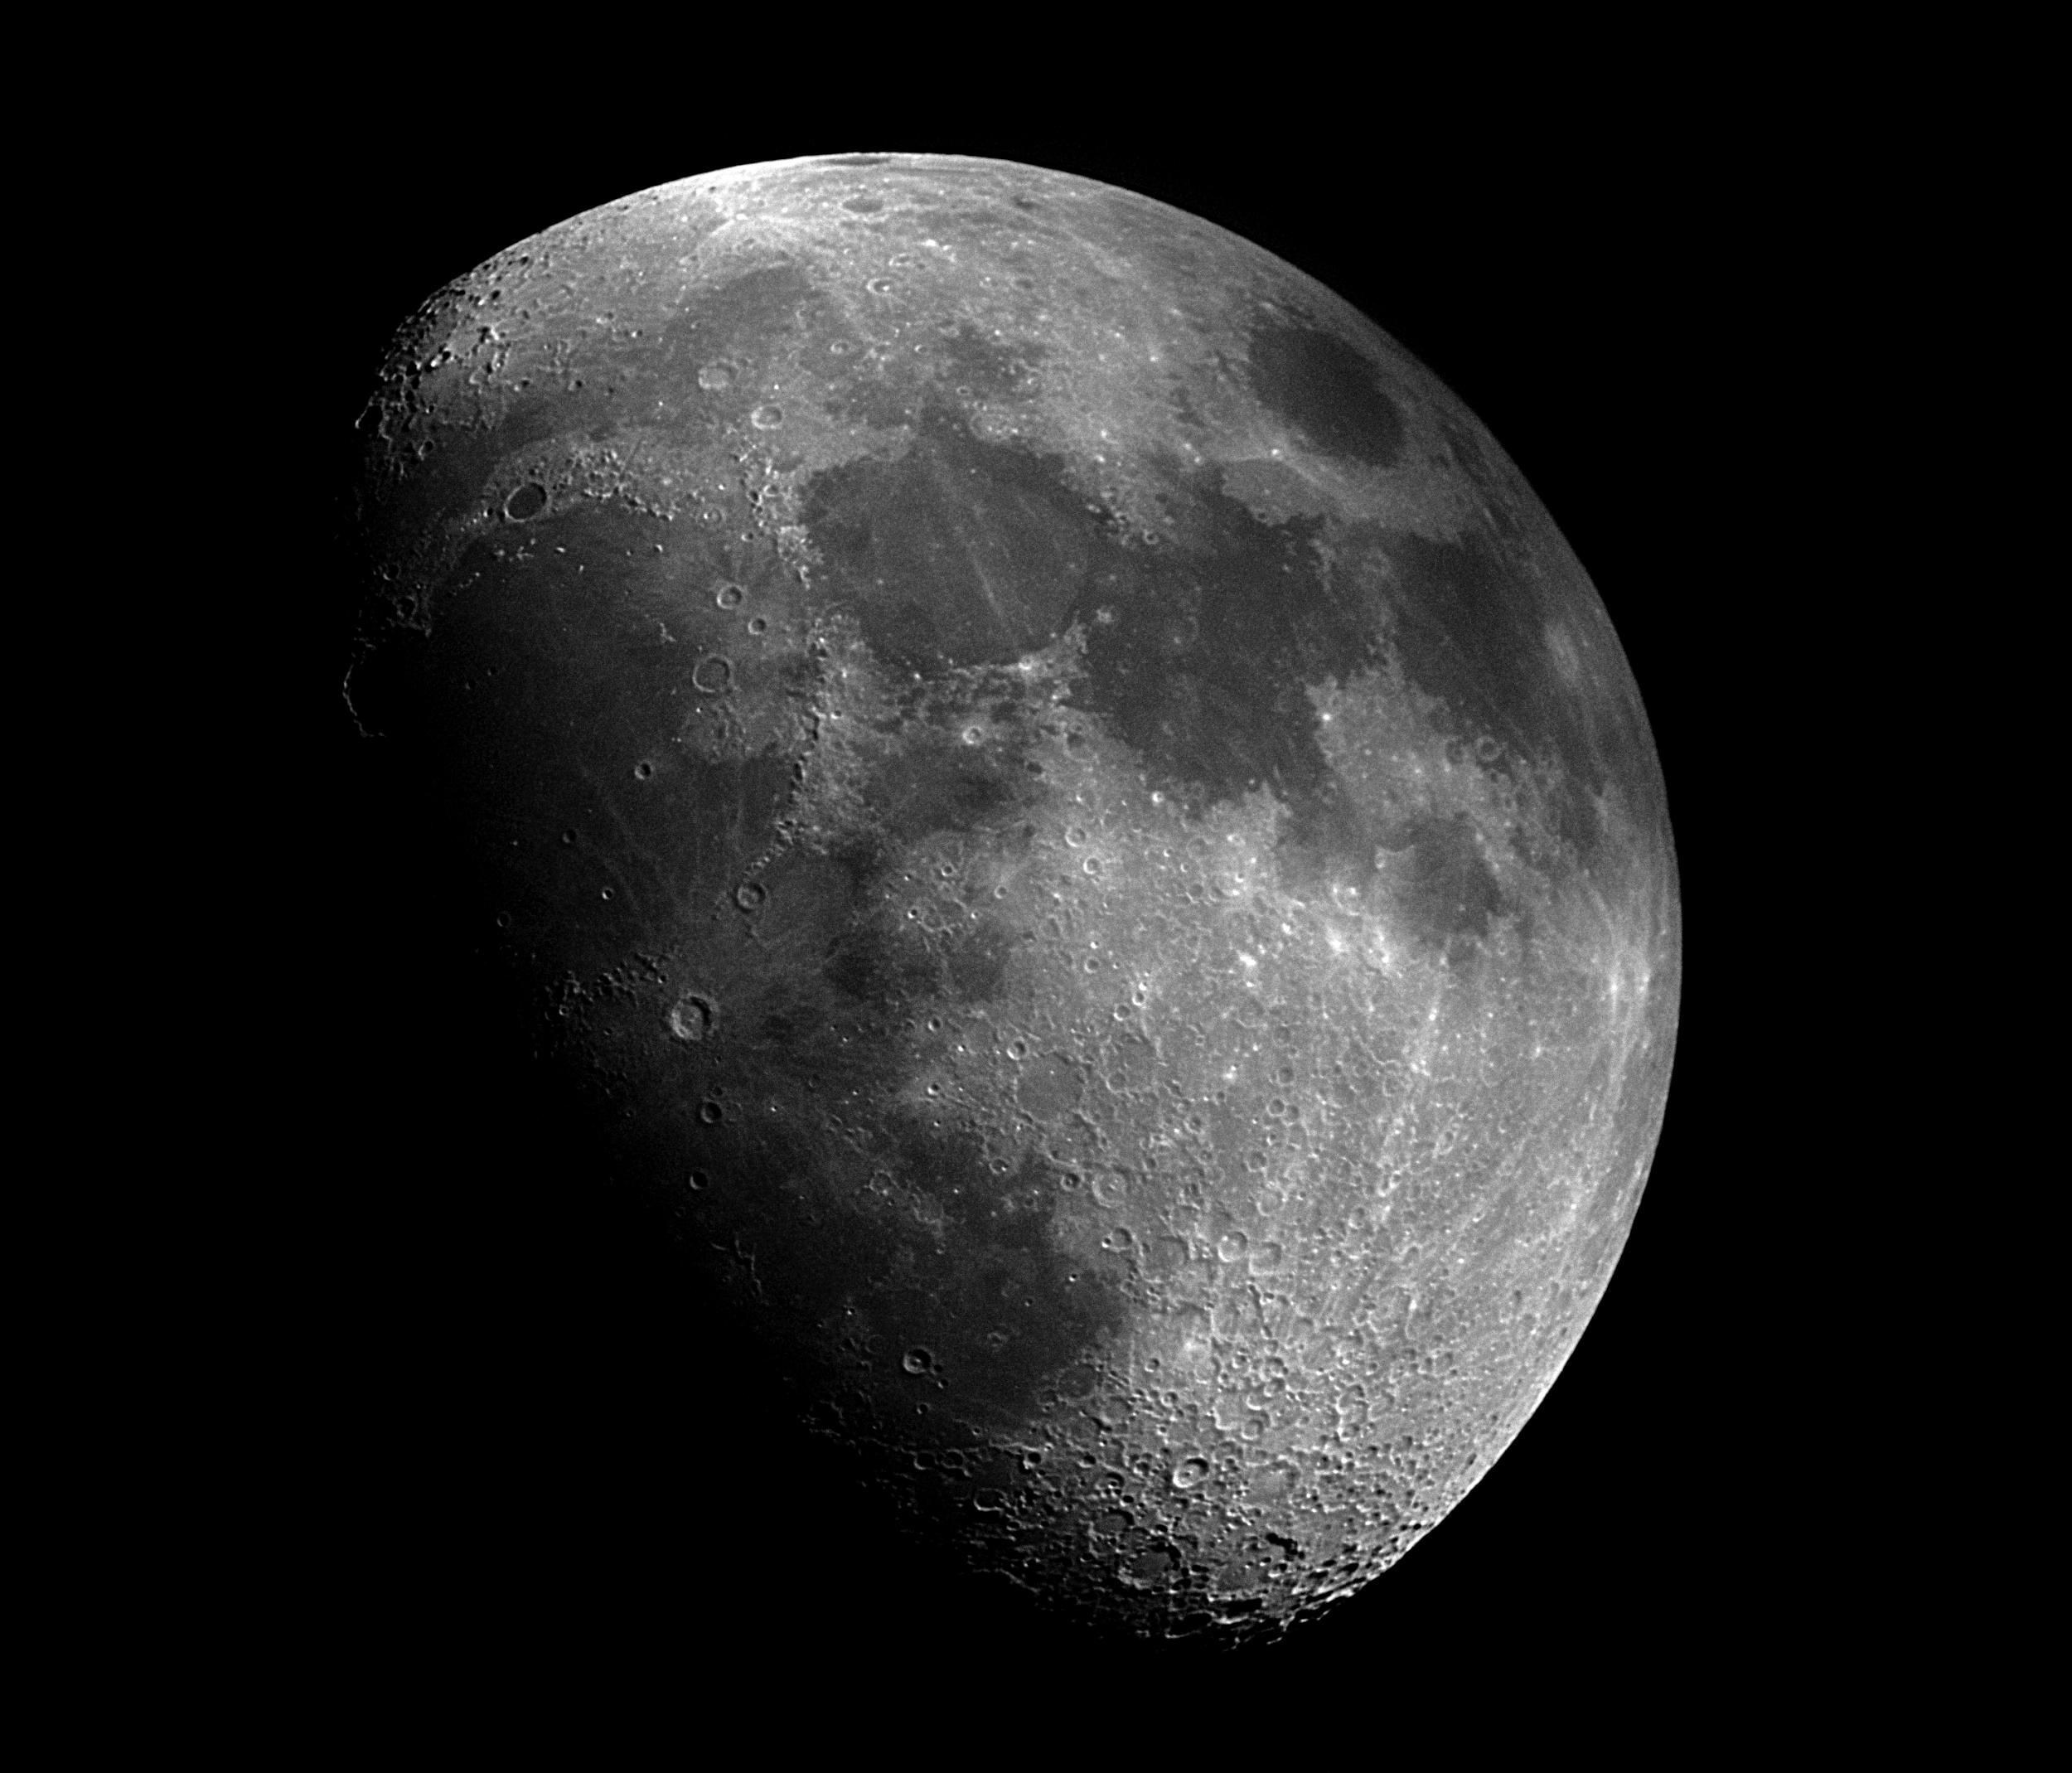 Mike Klinke's moon shot